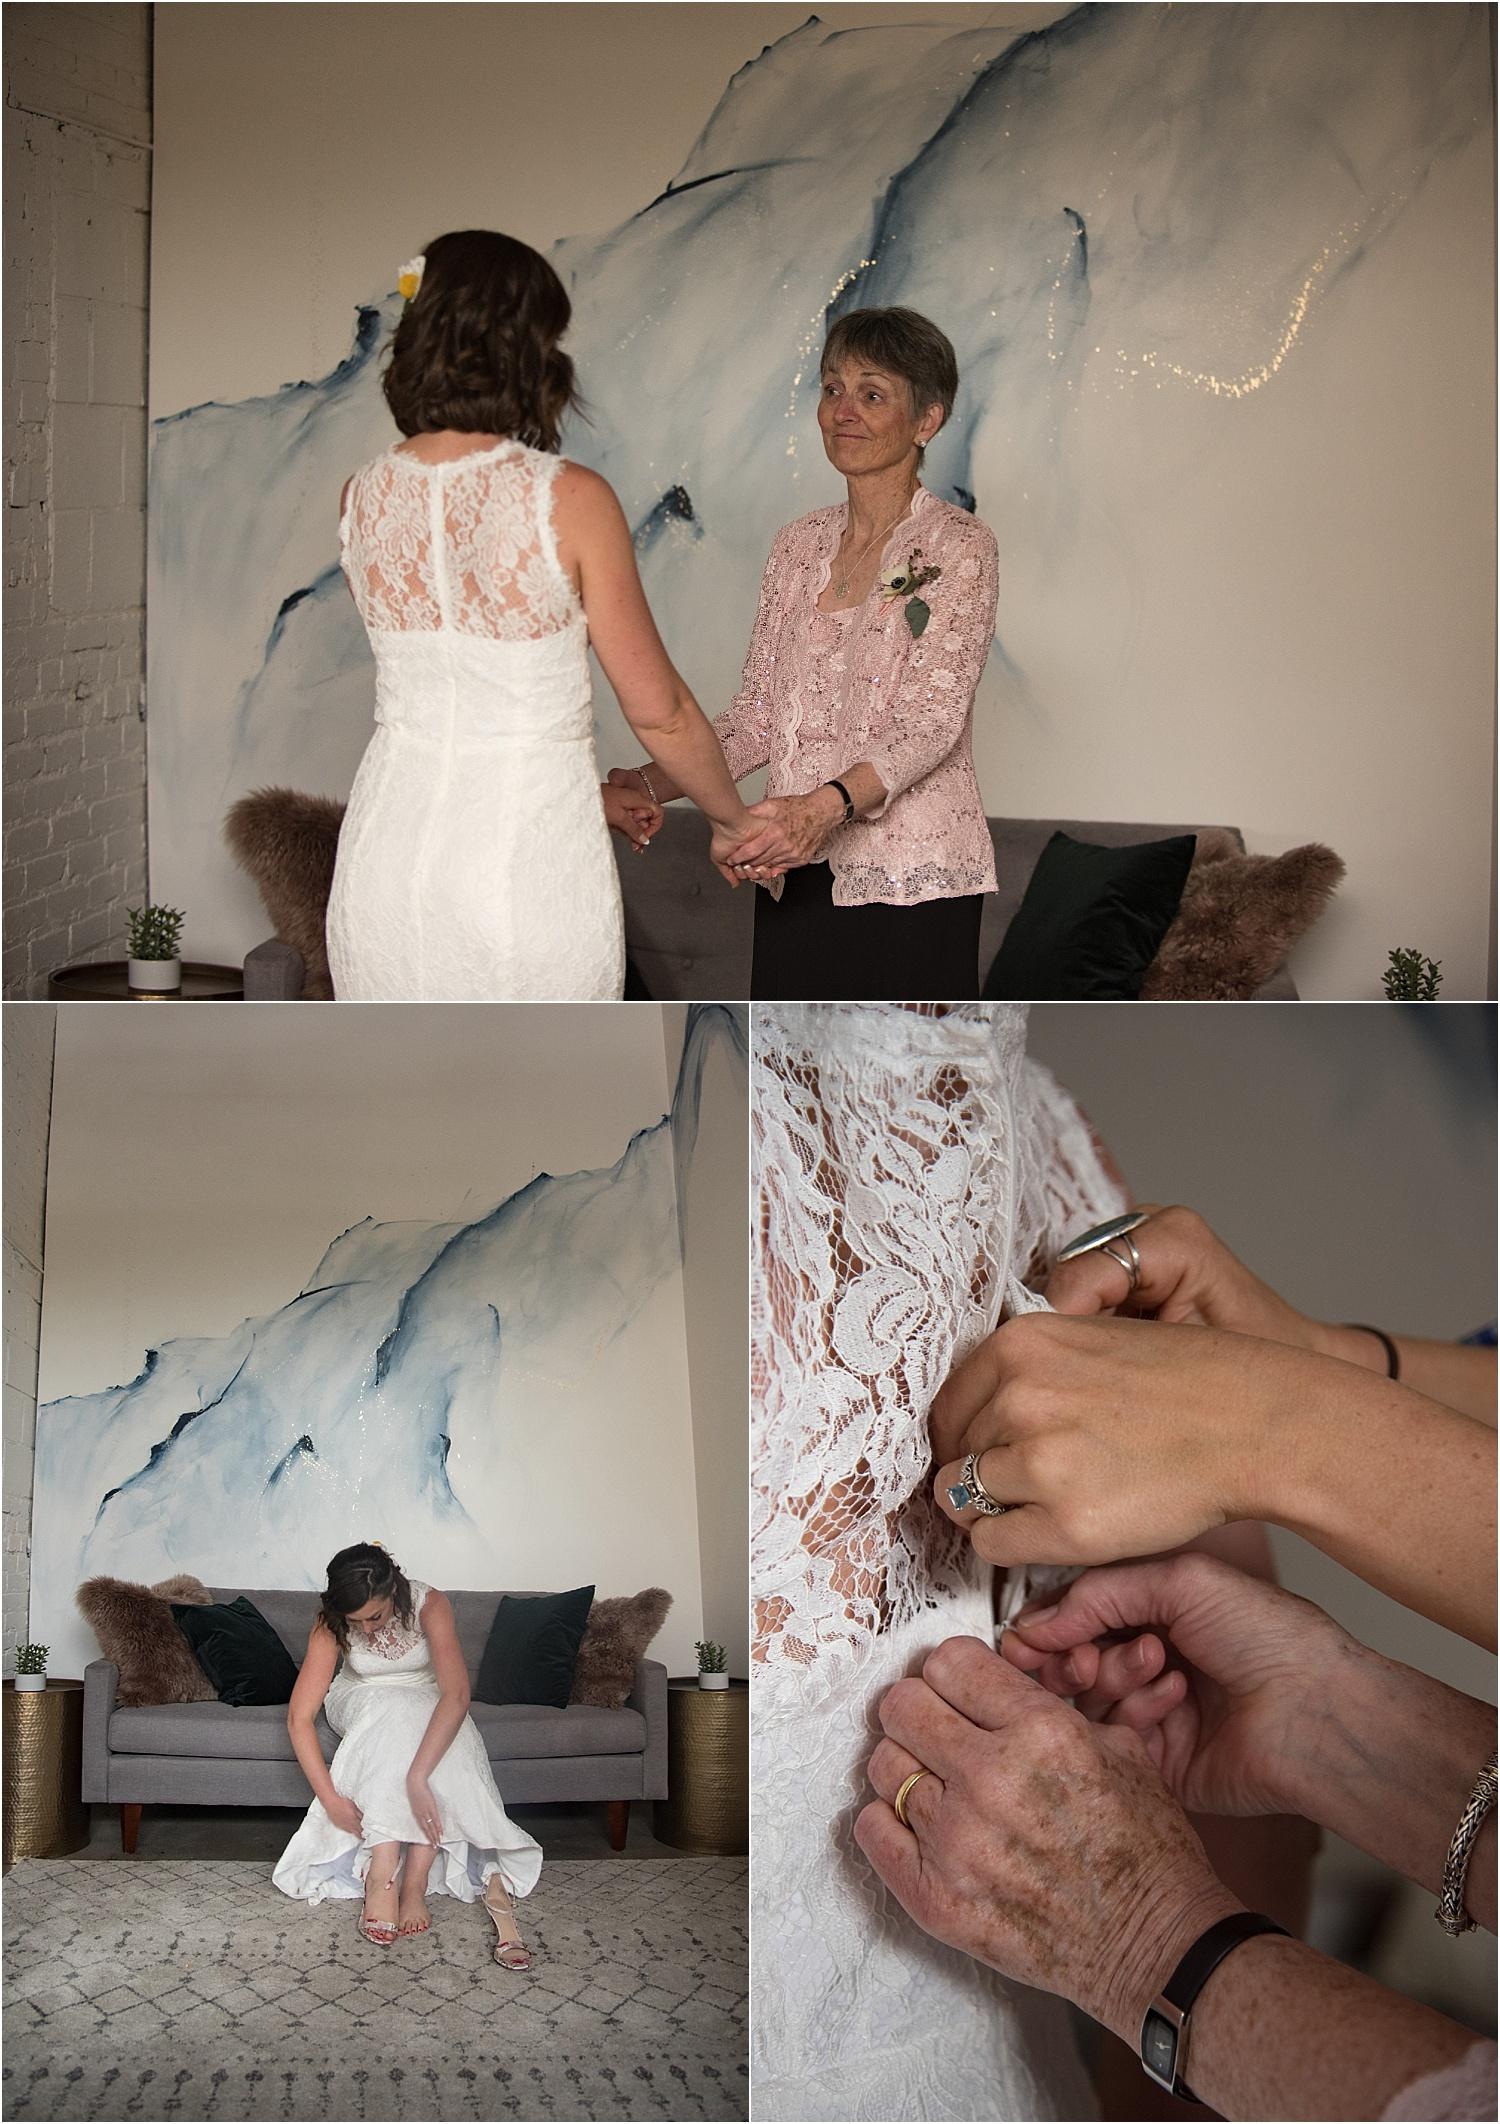 Denver_Wedding_Photography_Skylight_Urban_Venue_Modern_Bride_007.jpg